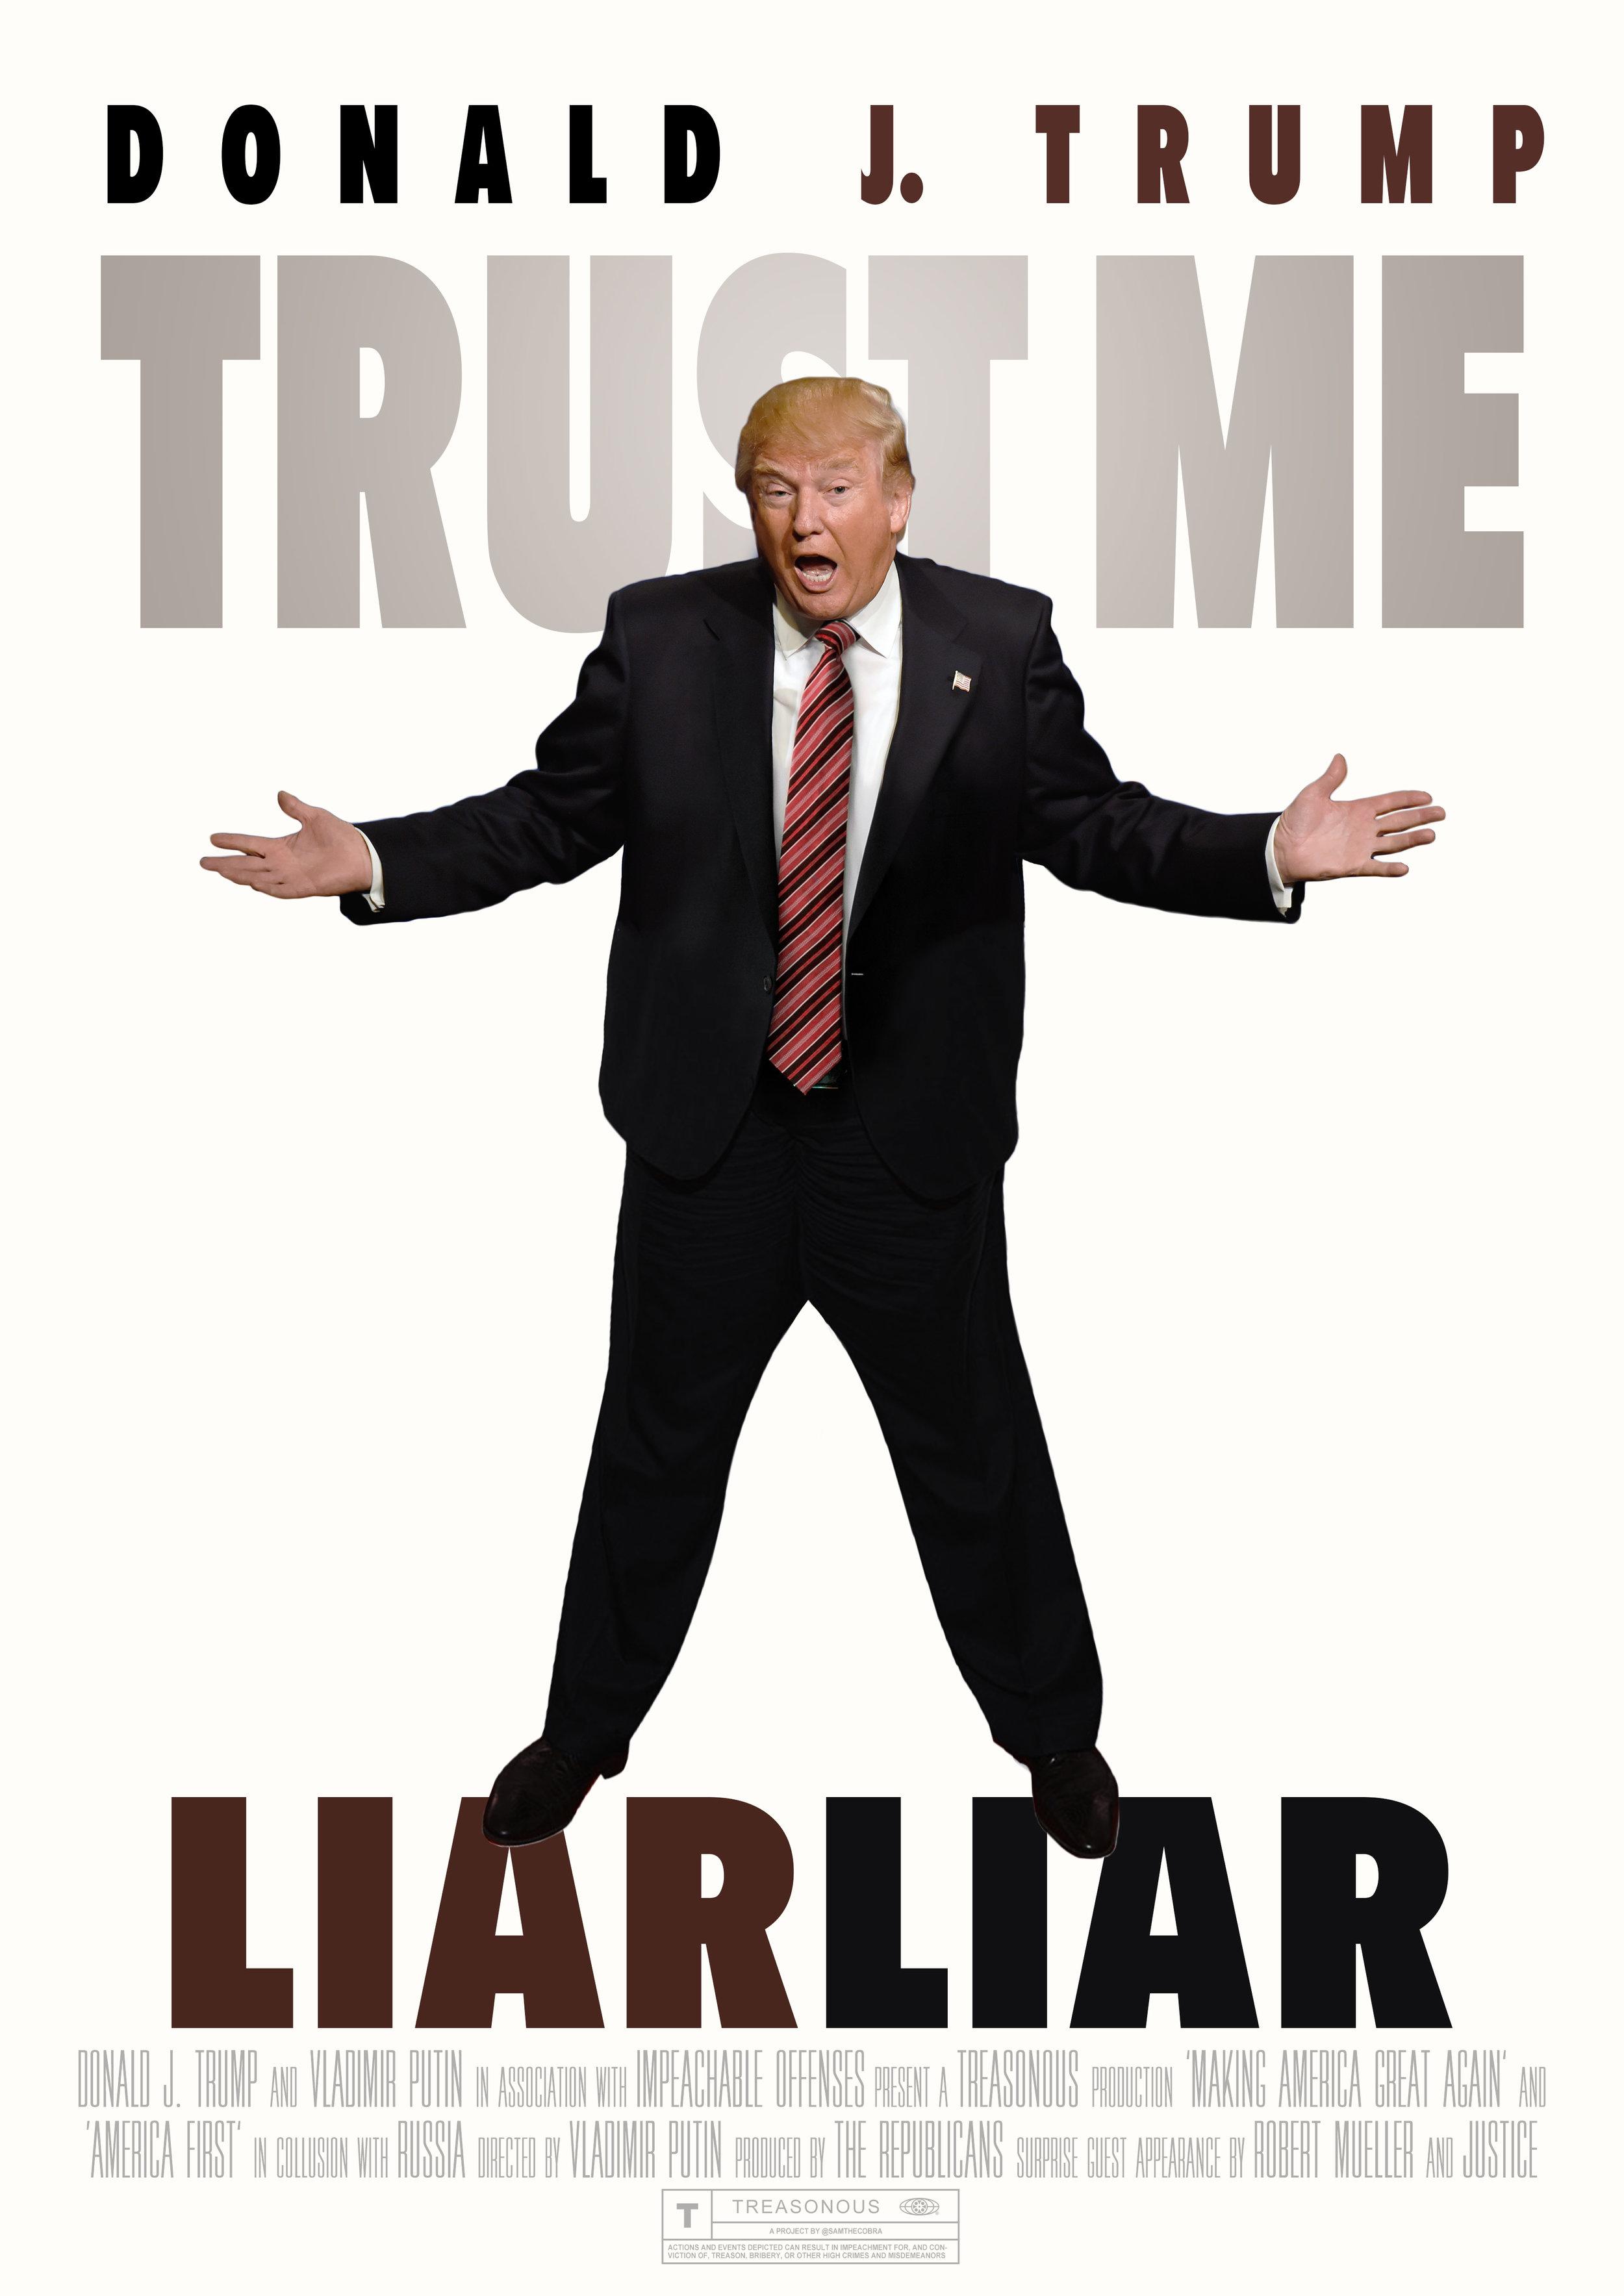 1_TrumpPoster_LiarLiar.jpg